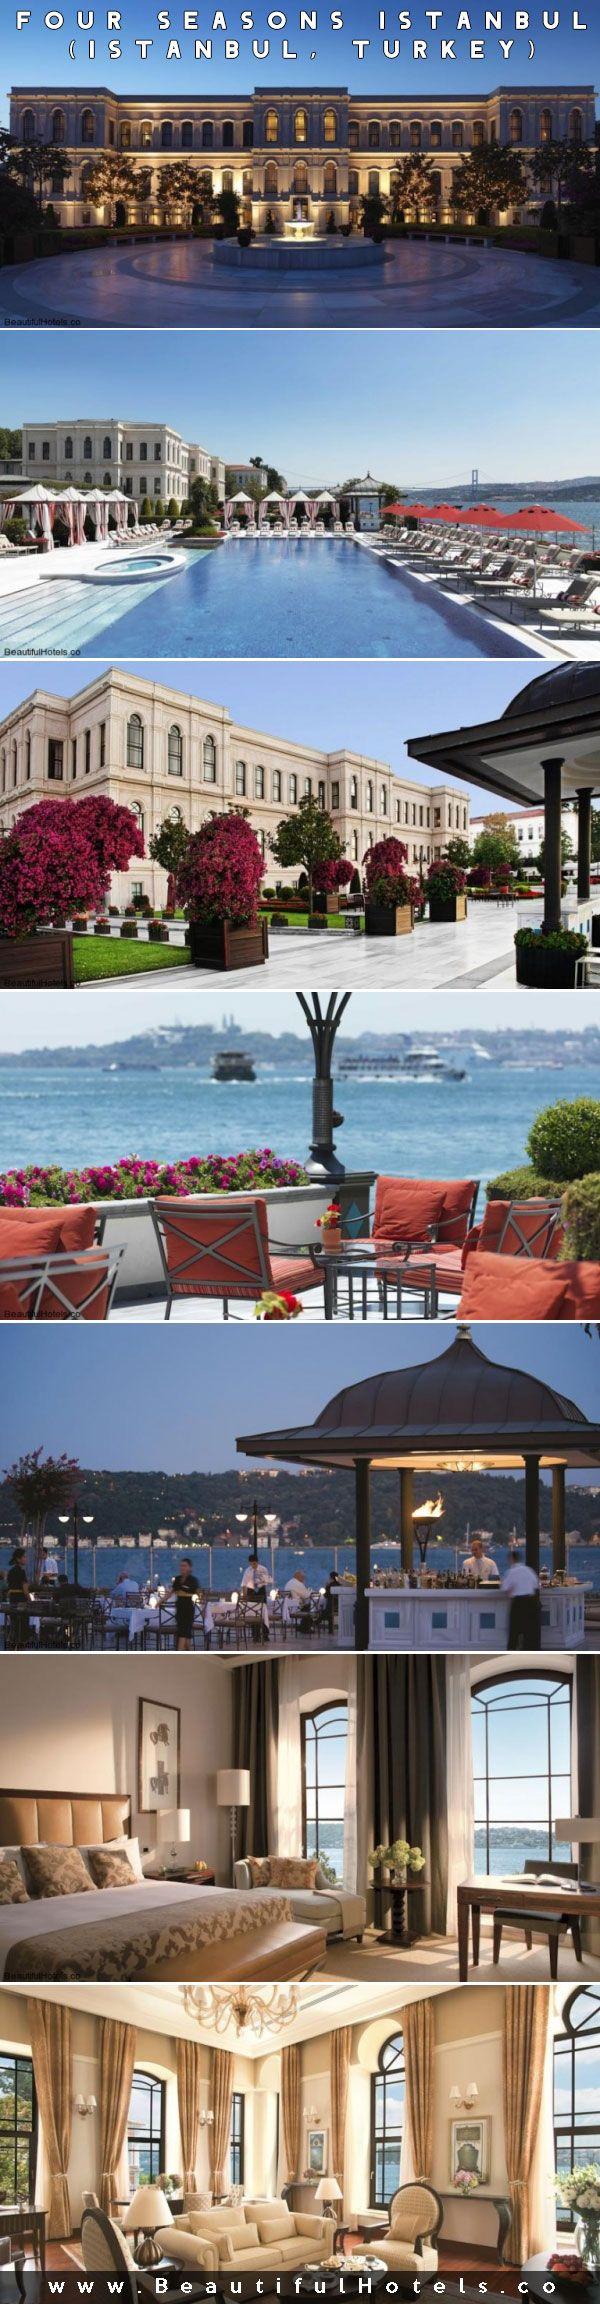 Four Seasons Istanbul at the Bosphorus (Istanbul, Turkey) *****